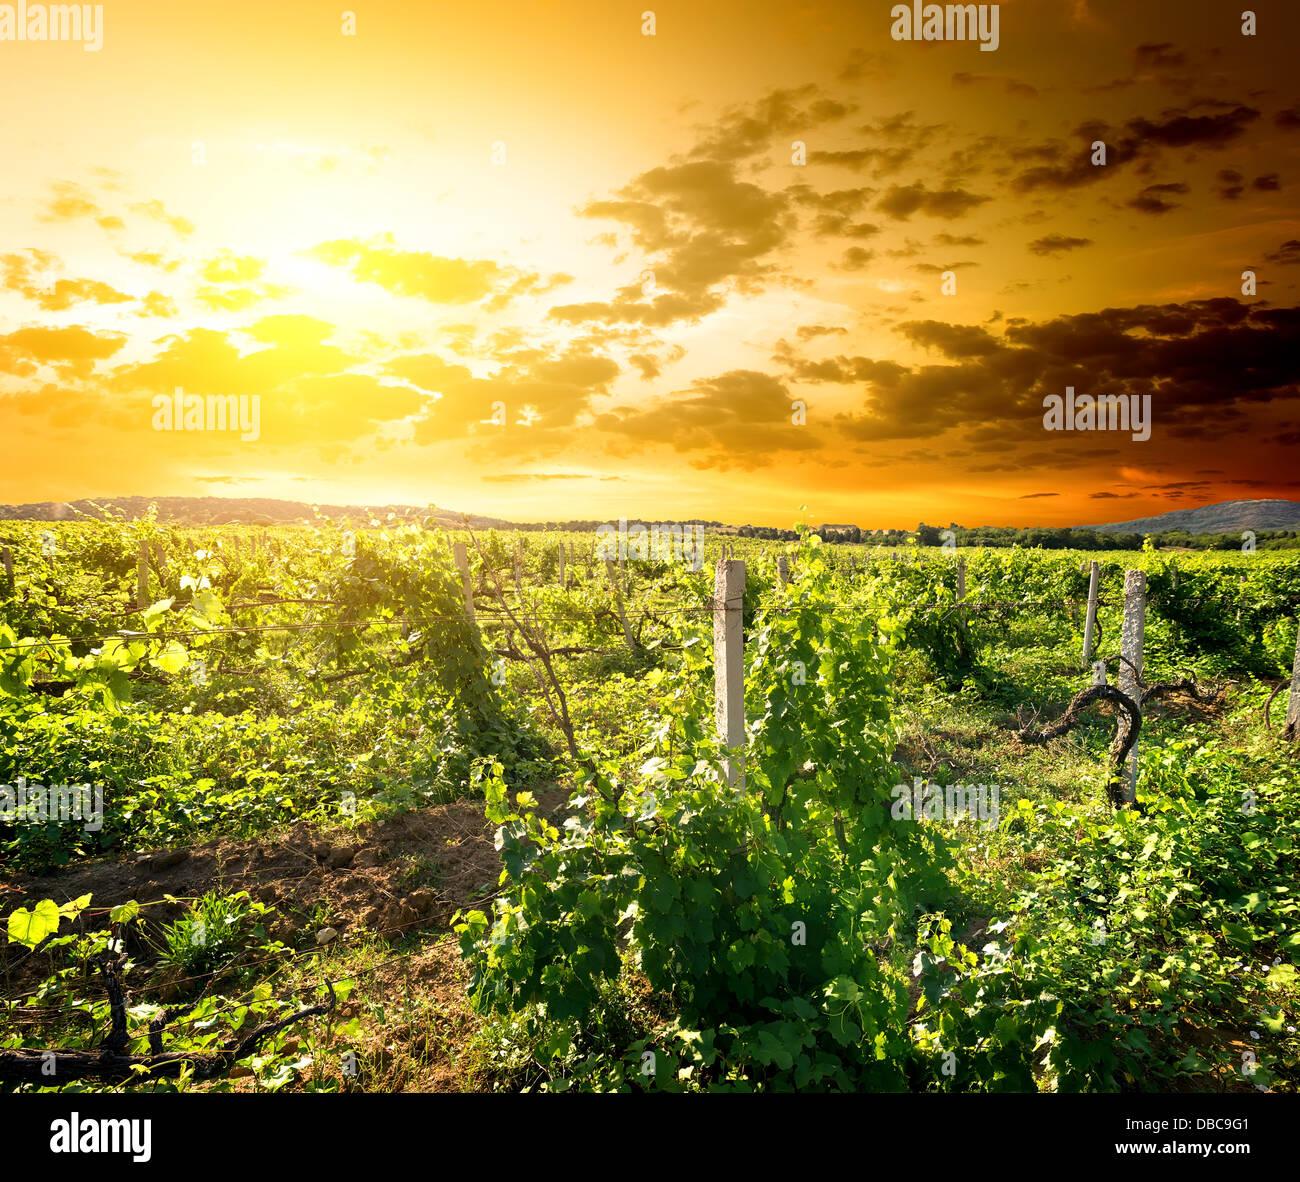 Grüne Vinyard bei den Sonnenaufgang auf der Krim Stockbild